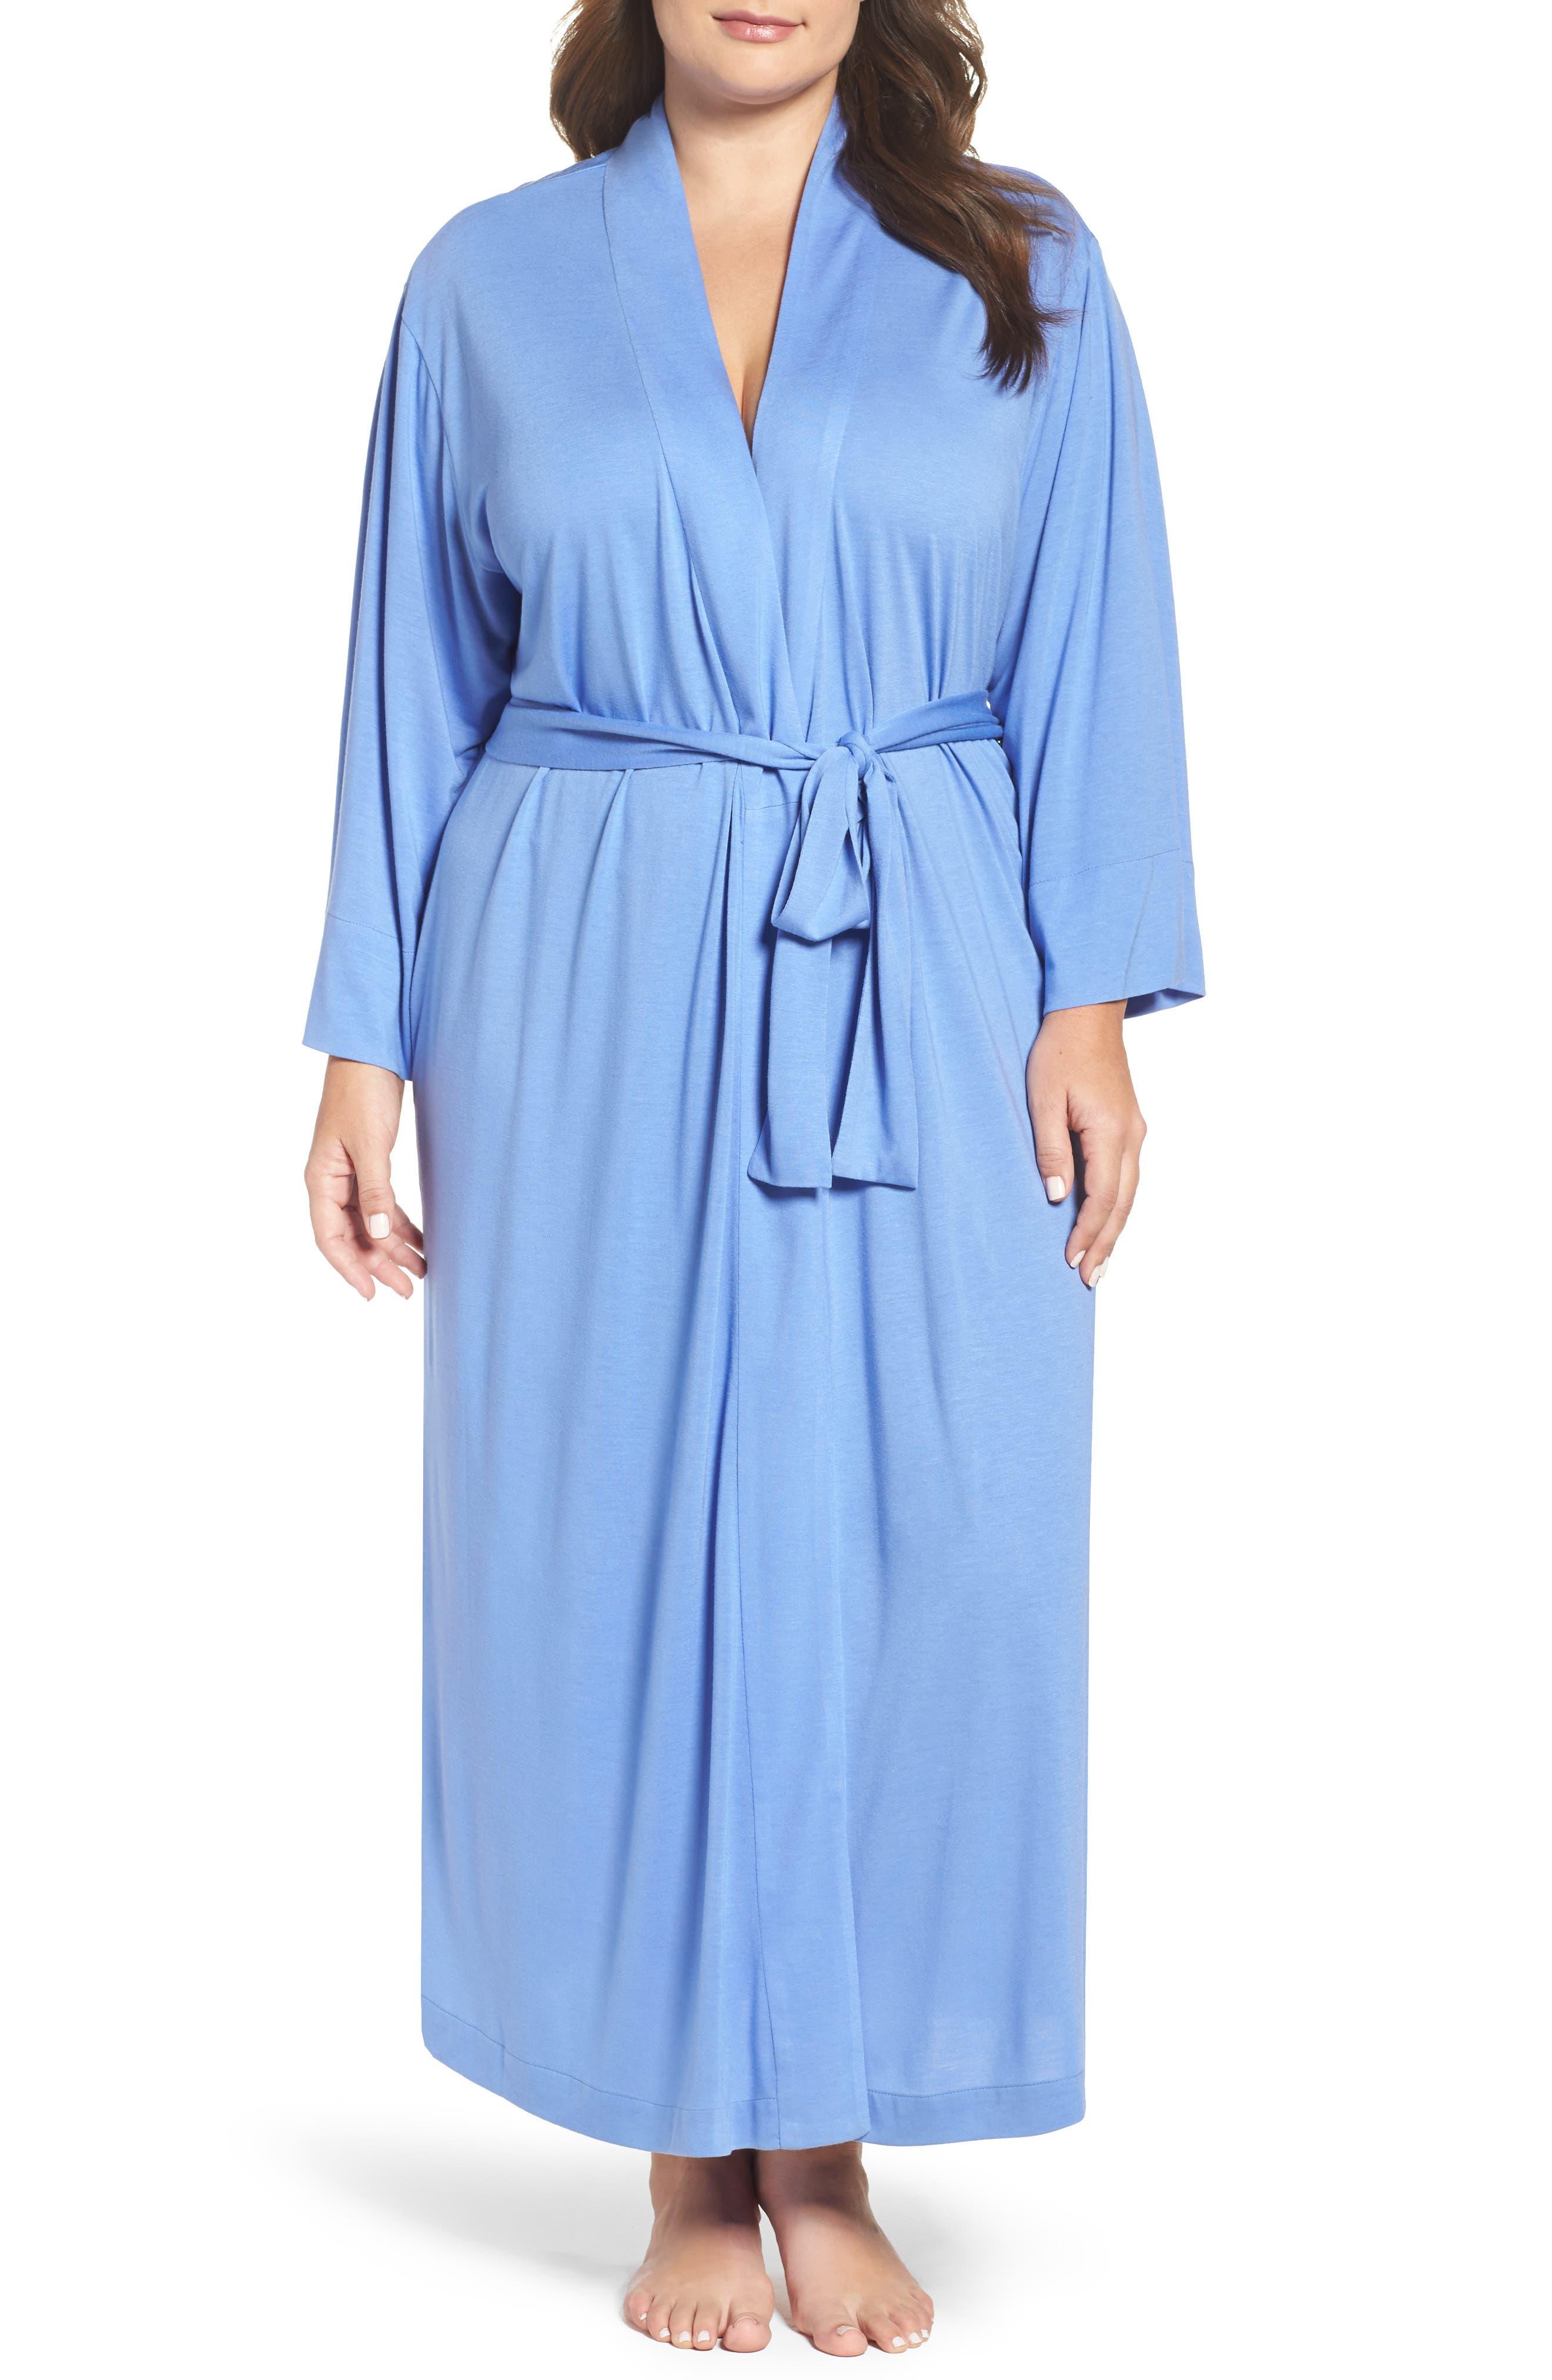 Alternate Image 1 Selected - Natori 'Shangri-La' Robe (Plus Size)